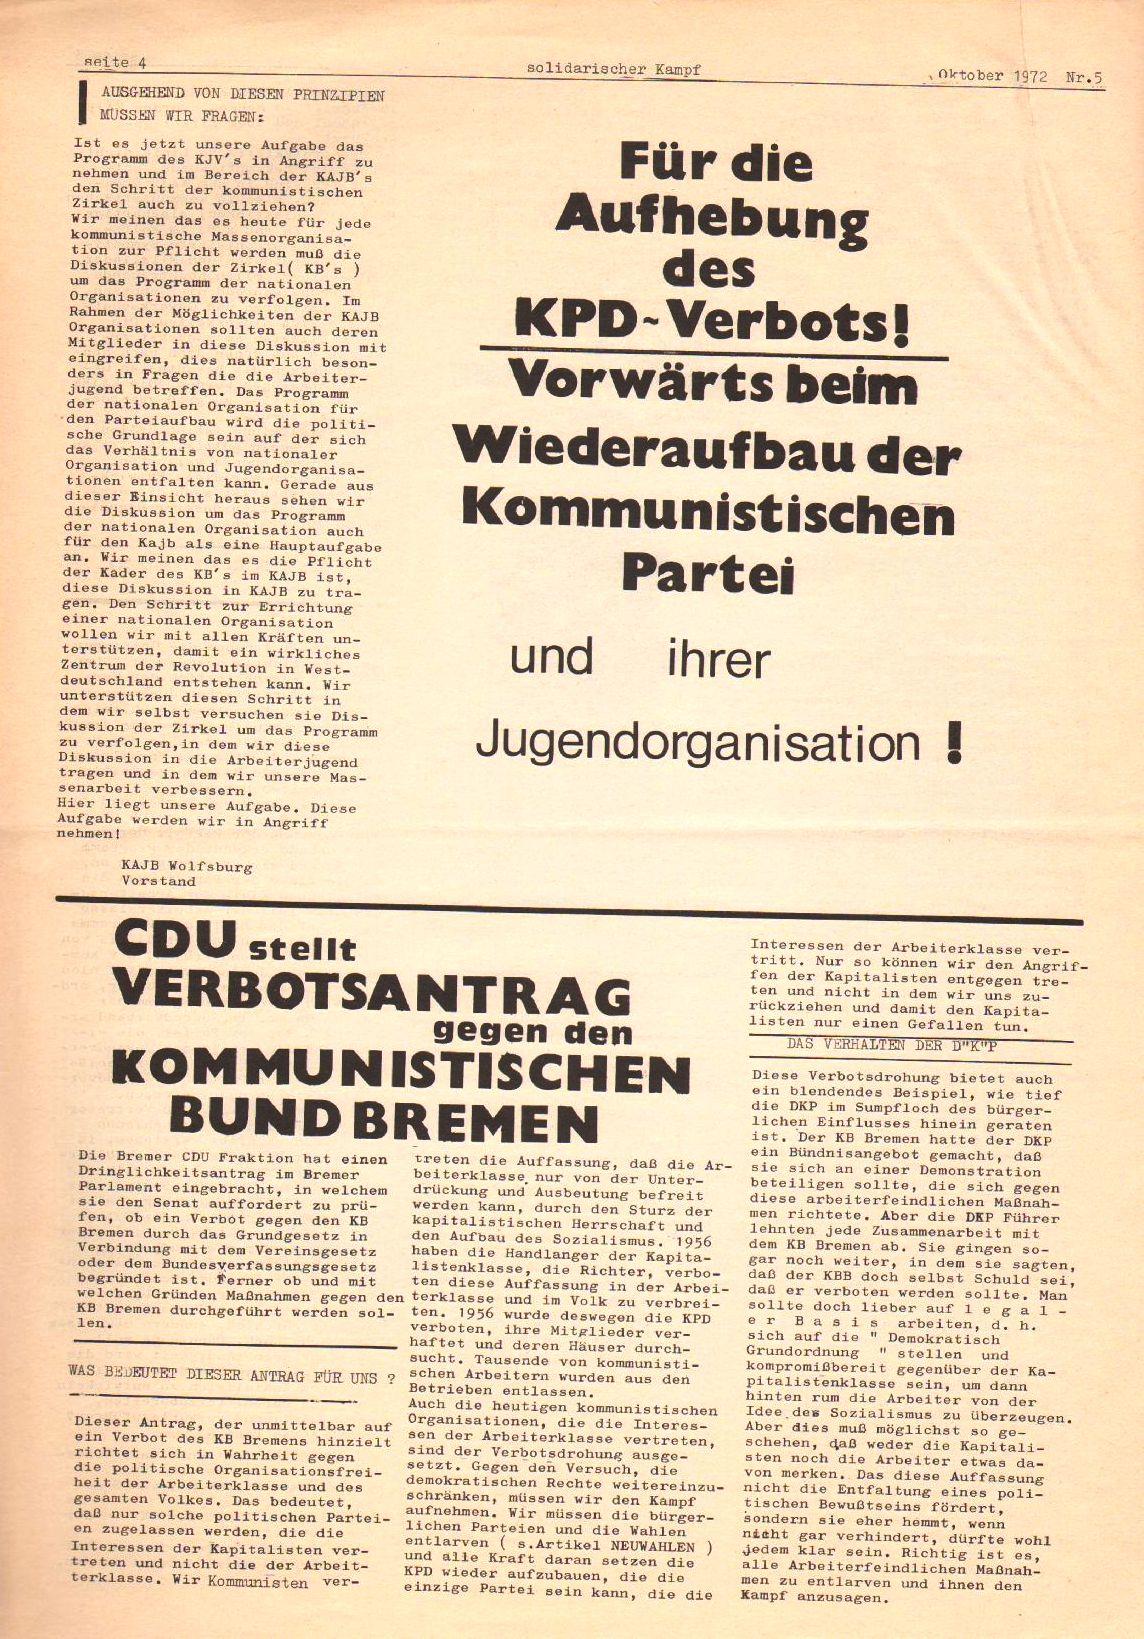 Wolfsburg_KAJB004